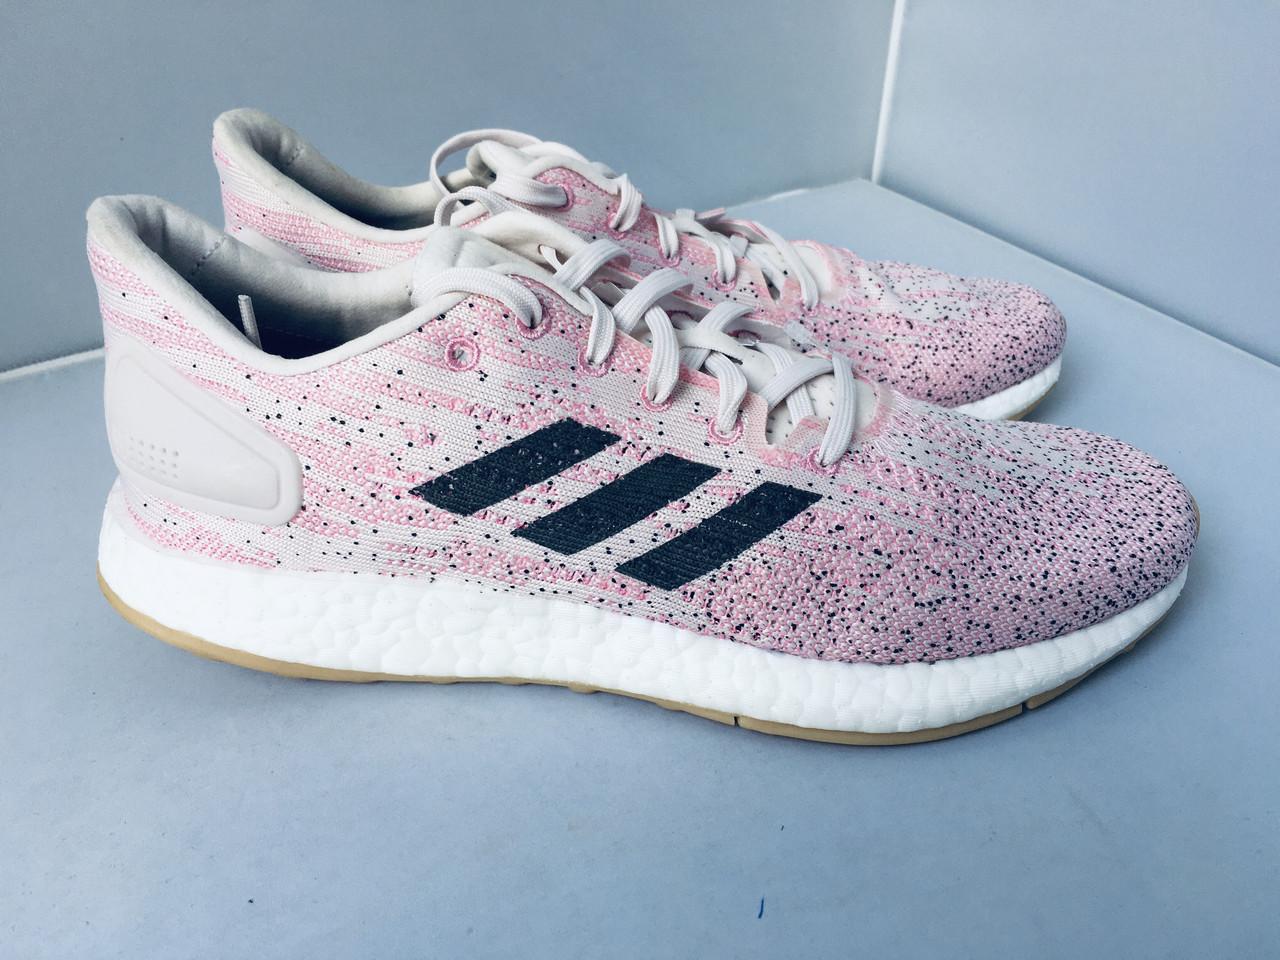 Кроссовки Adidas Pure Boost, 41 размер